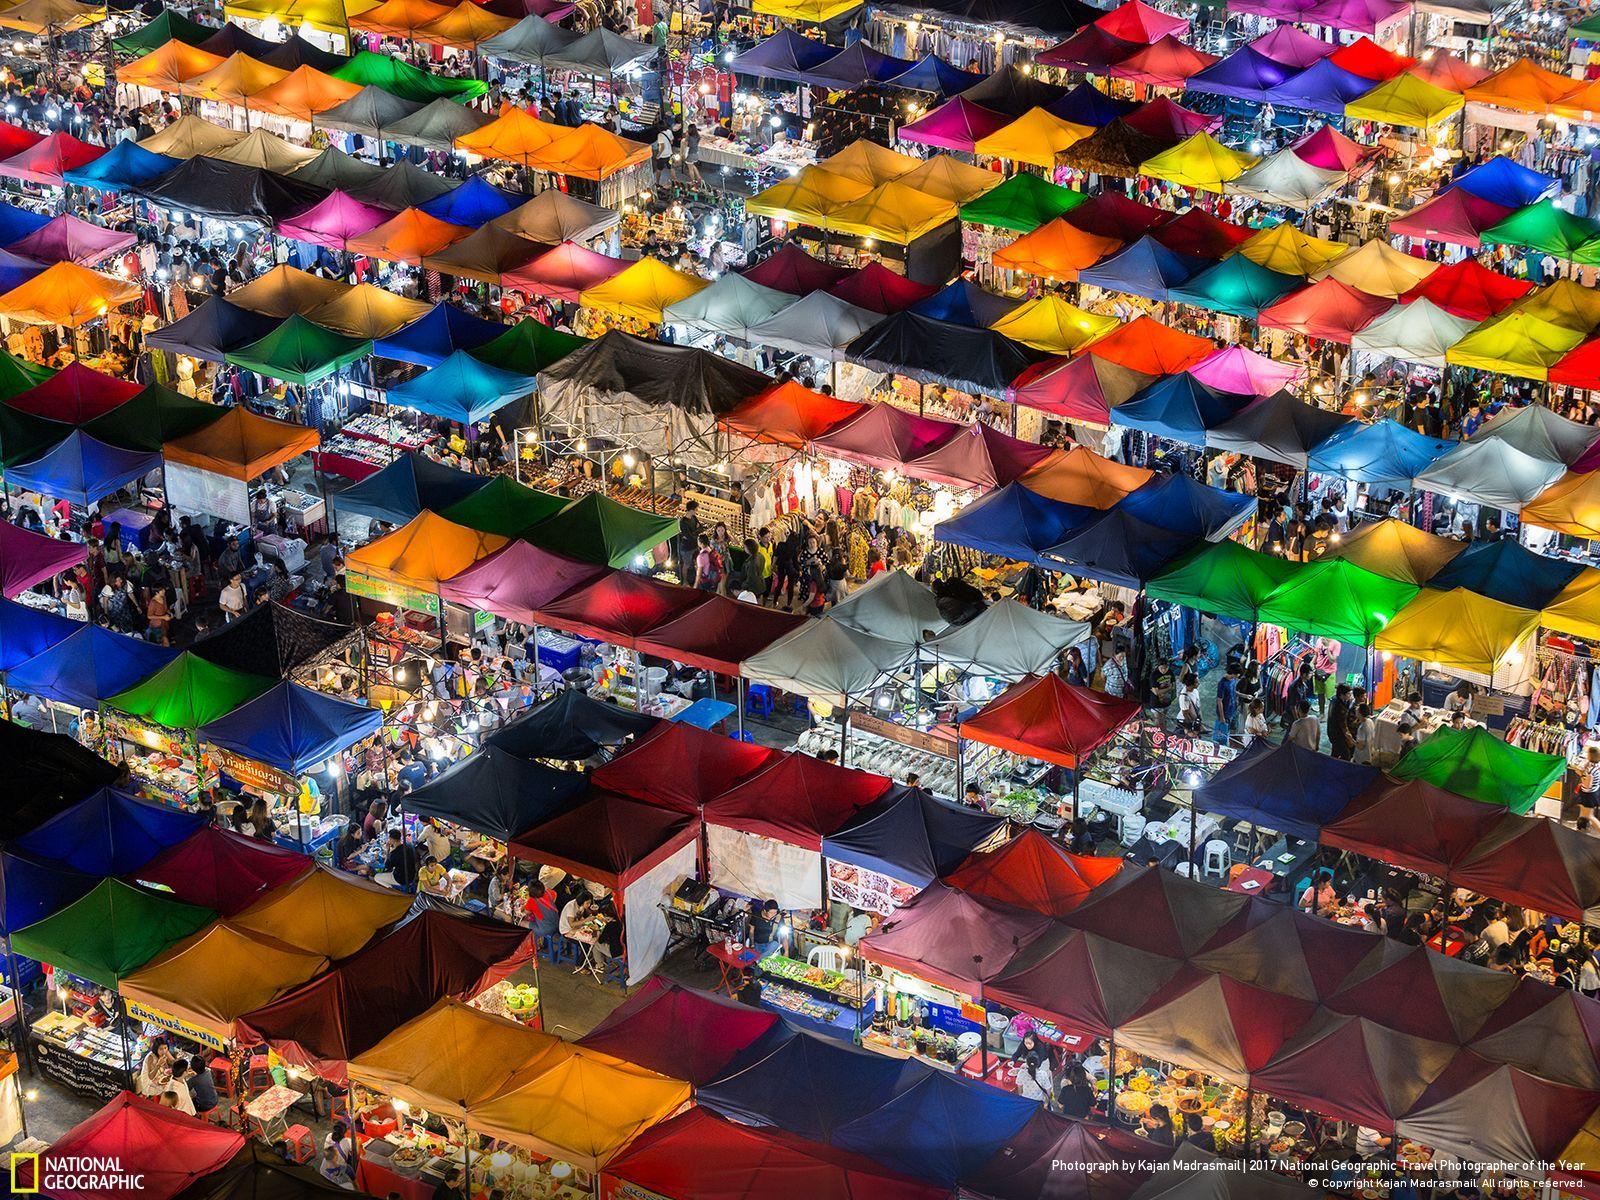 بازار رنگارنگ؛ عکس منتخب نشنال جئوگرافیک